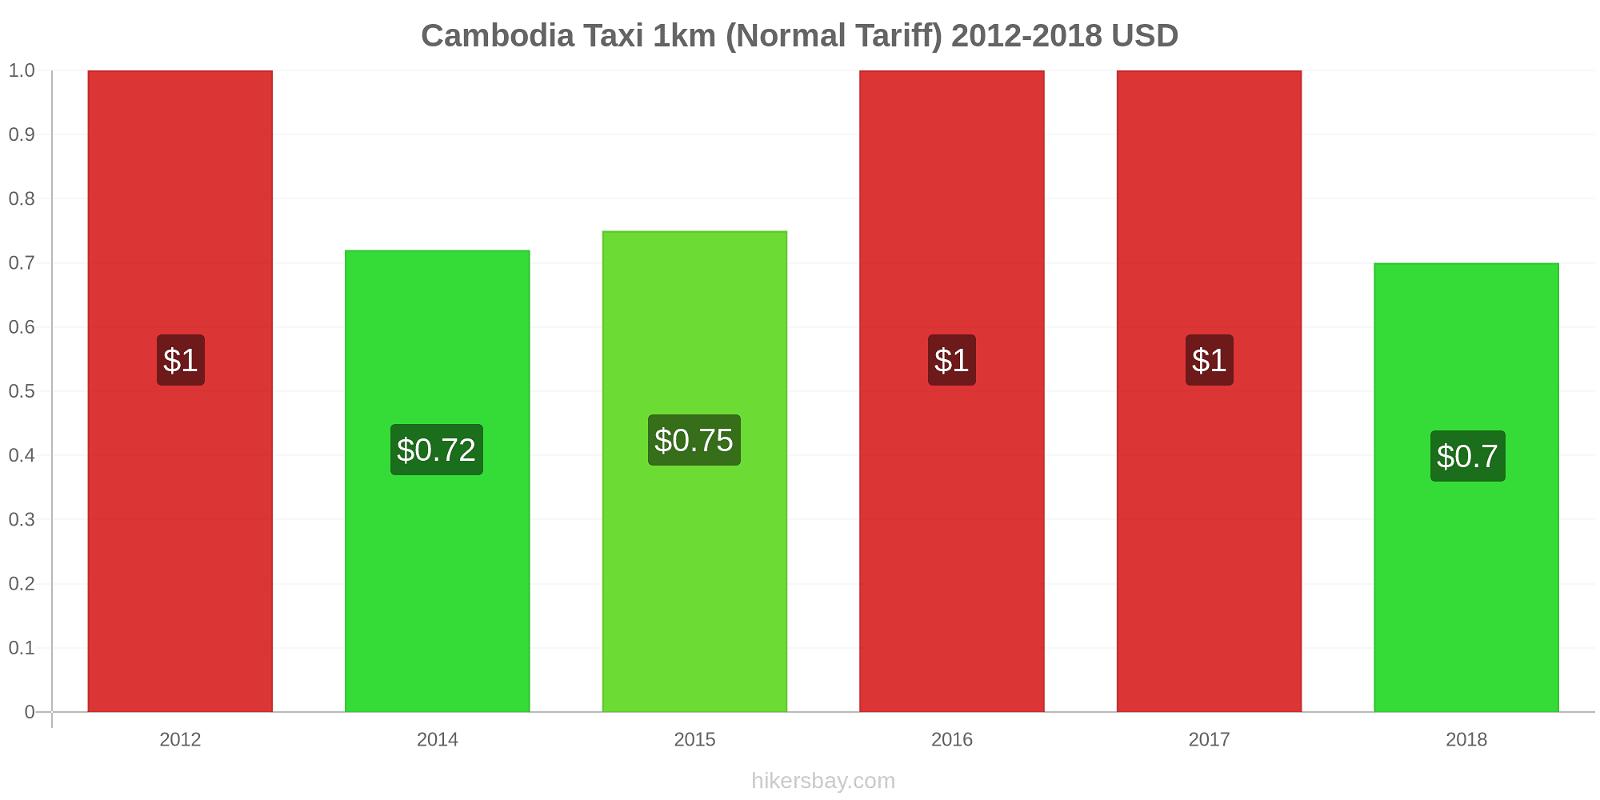 Cambodia price changes Taxi 1km (Normal Tariff) hikersbay.com